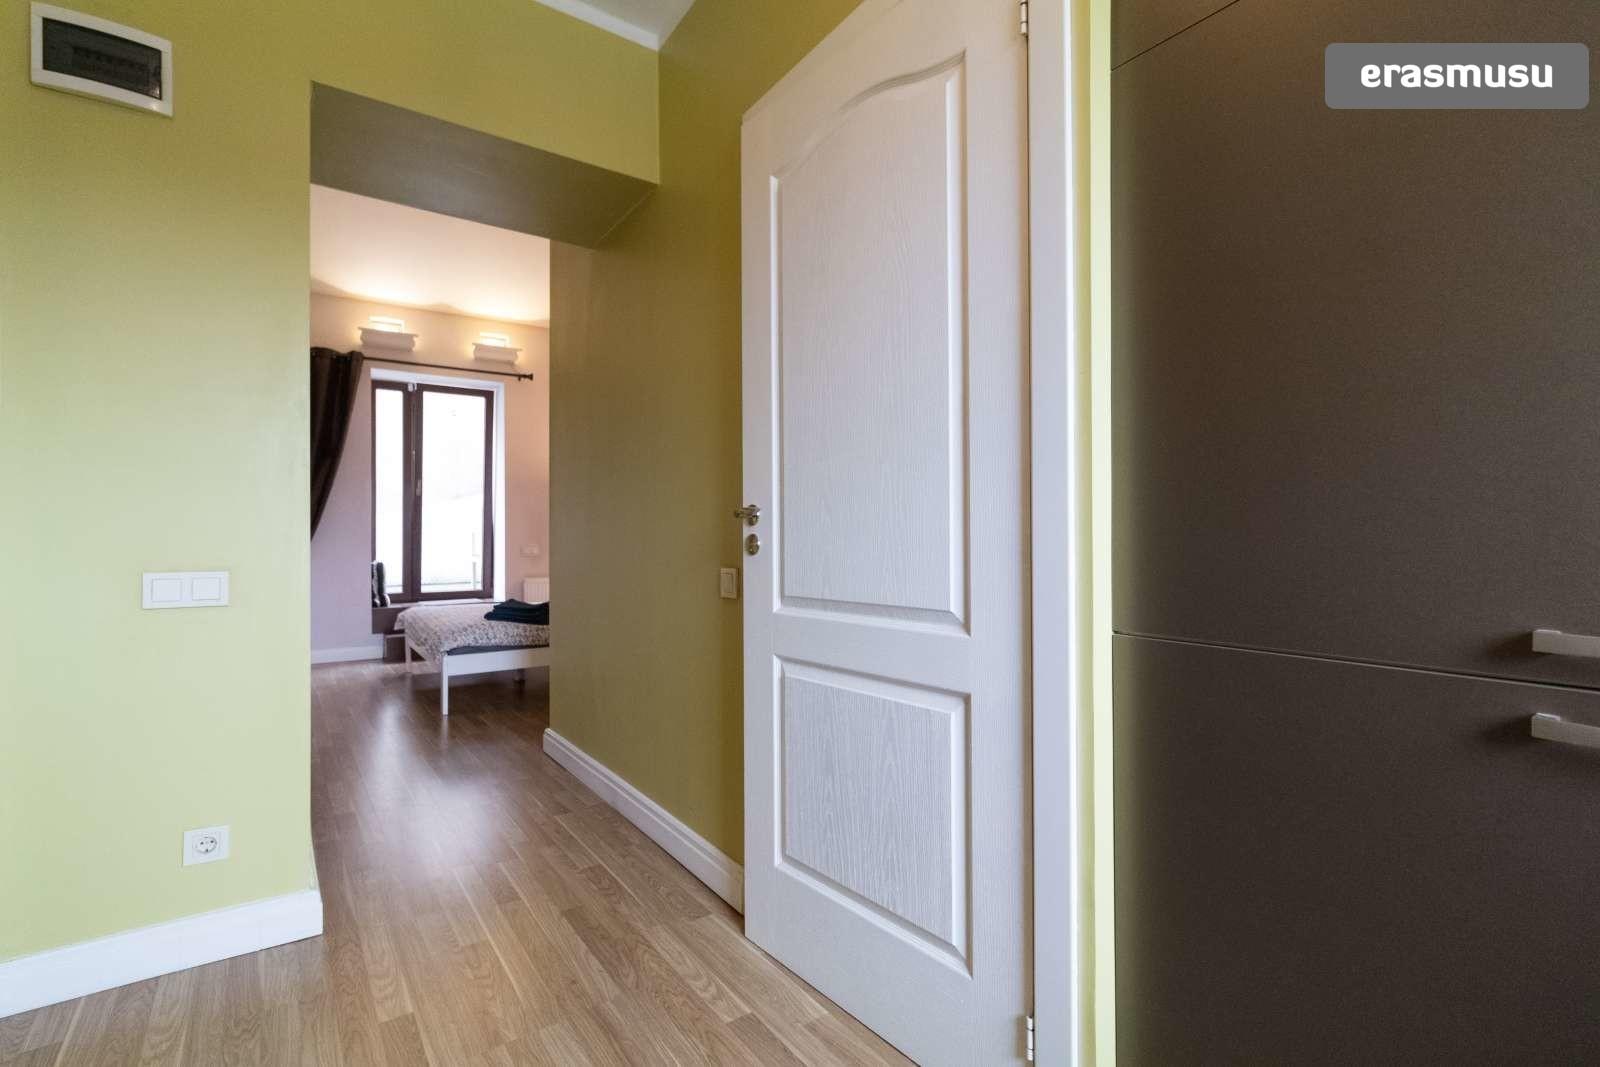 modern-studio-apartment-rent-maskavas-forstate-2e7bc56ee941bc8ae